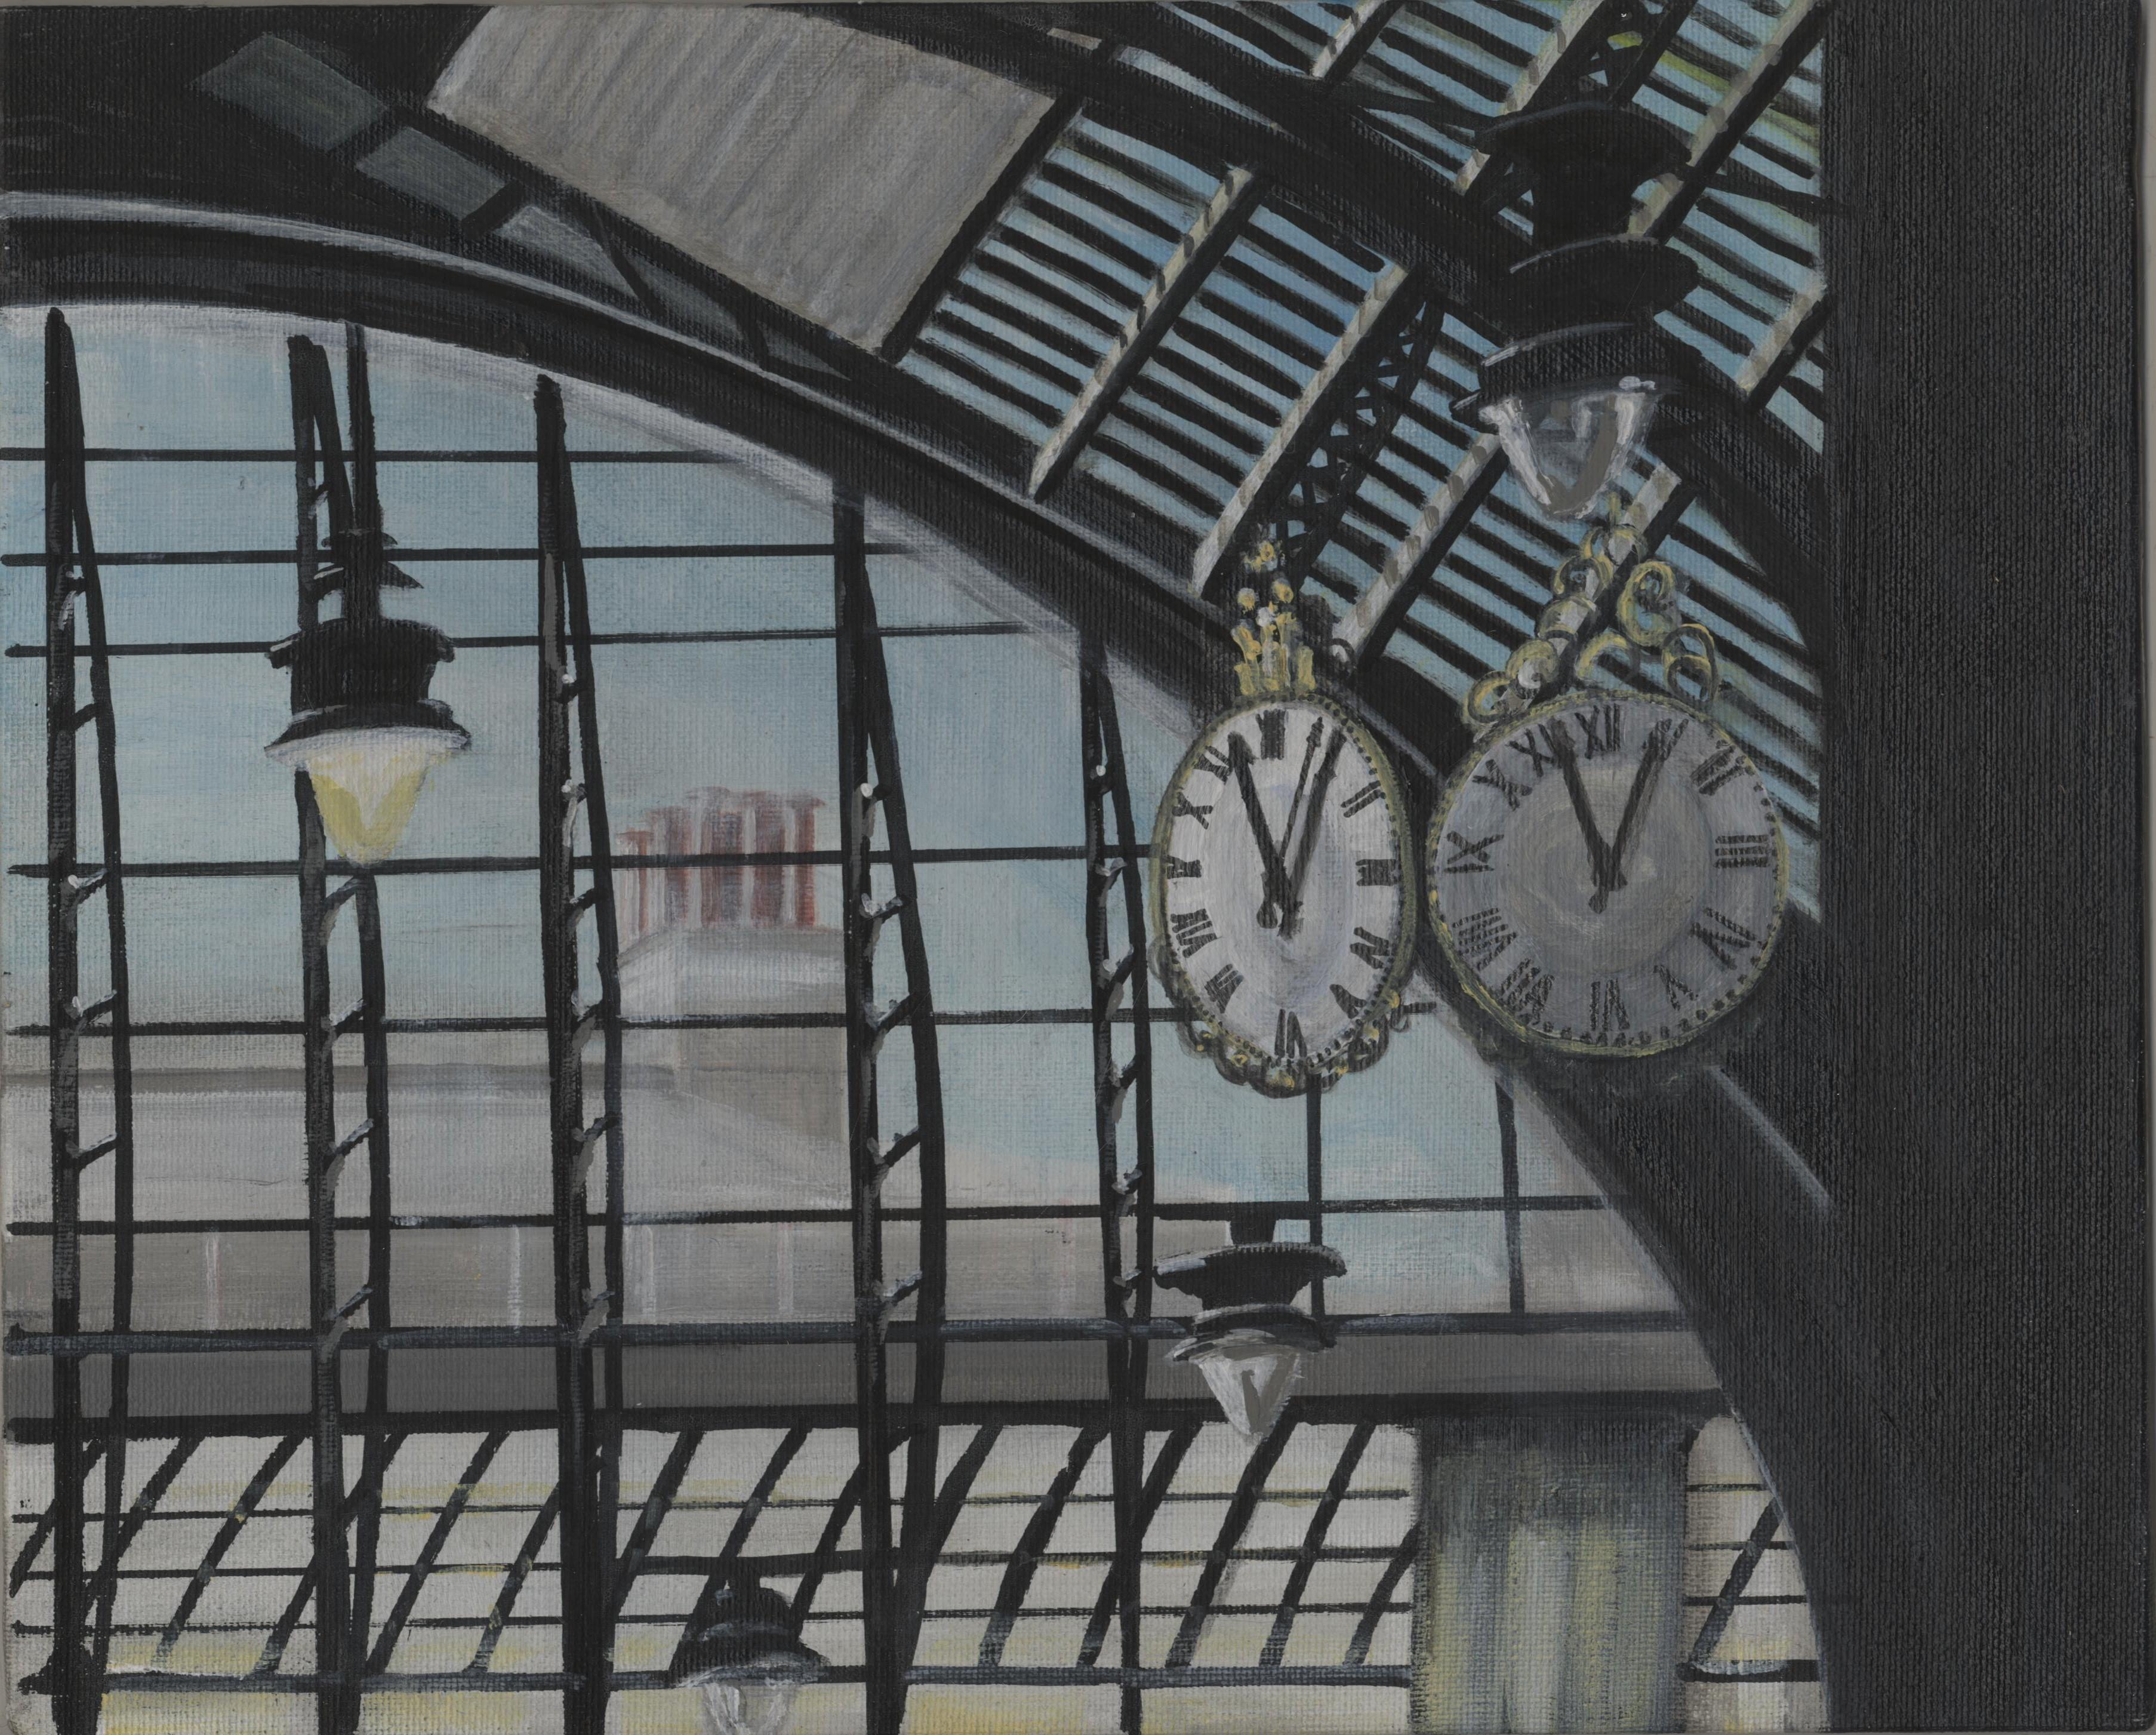 Meet me under the clock